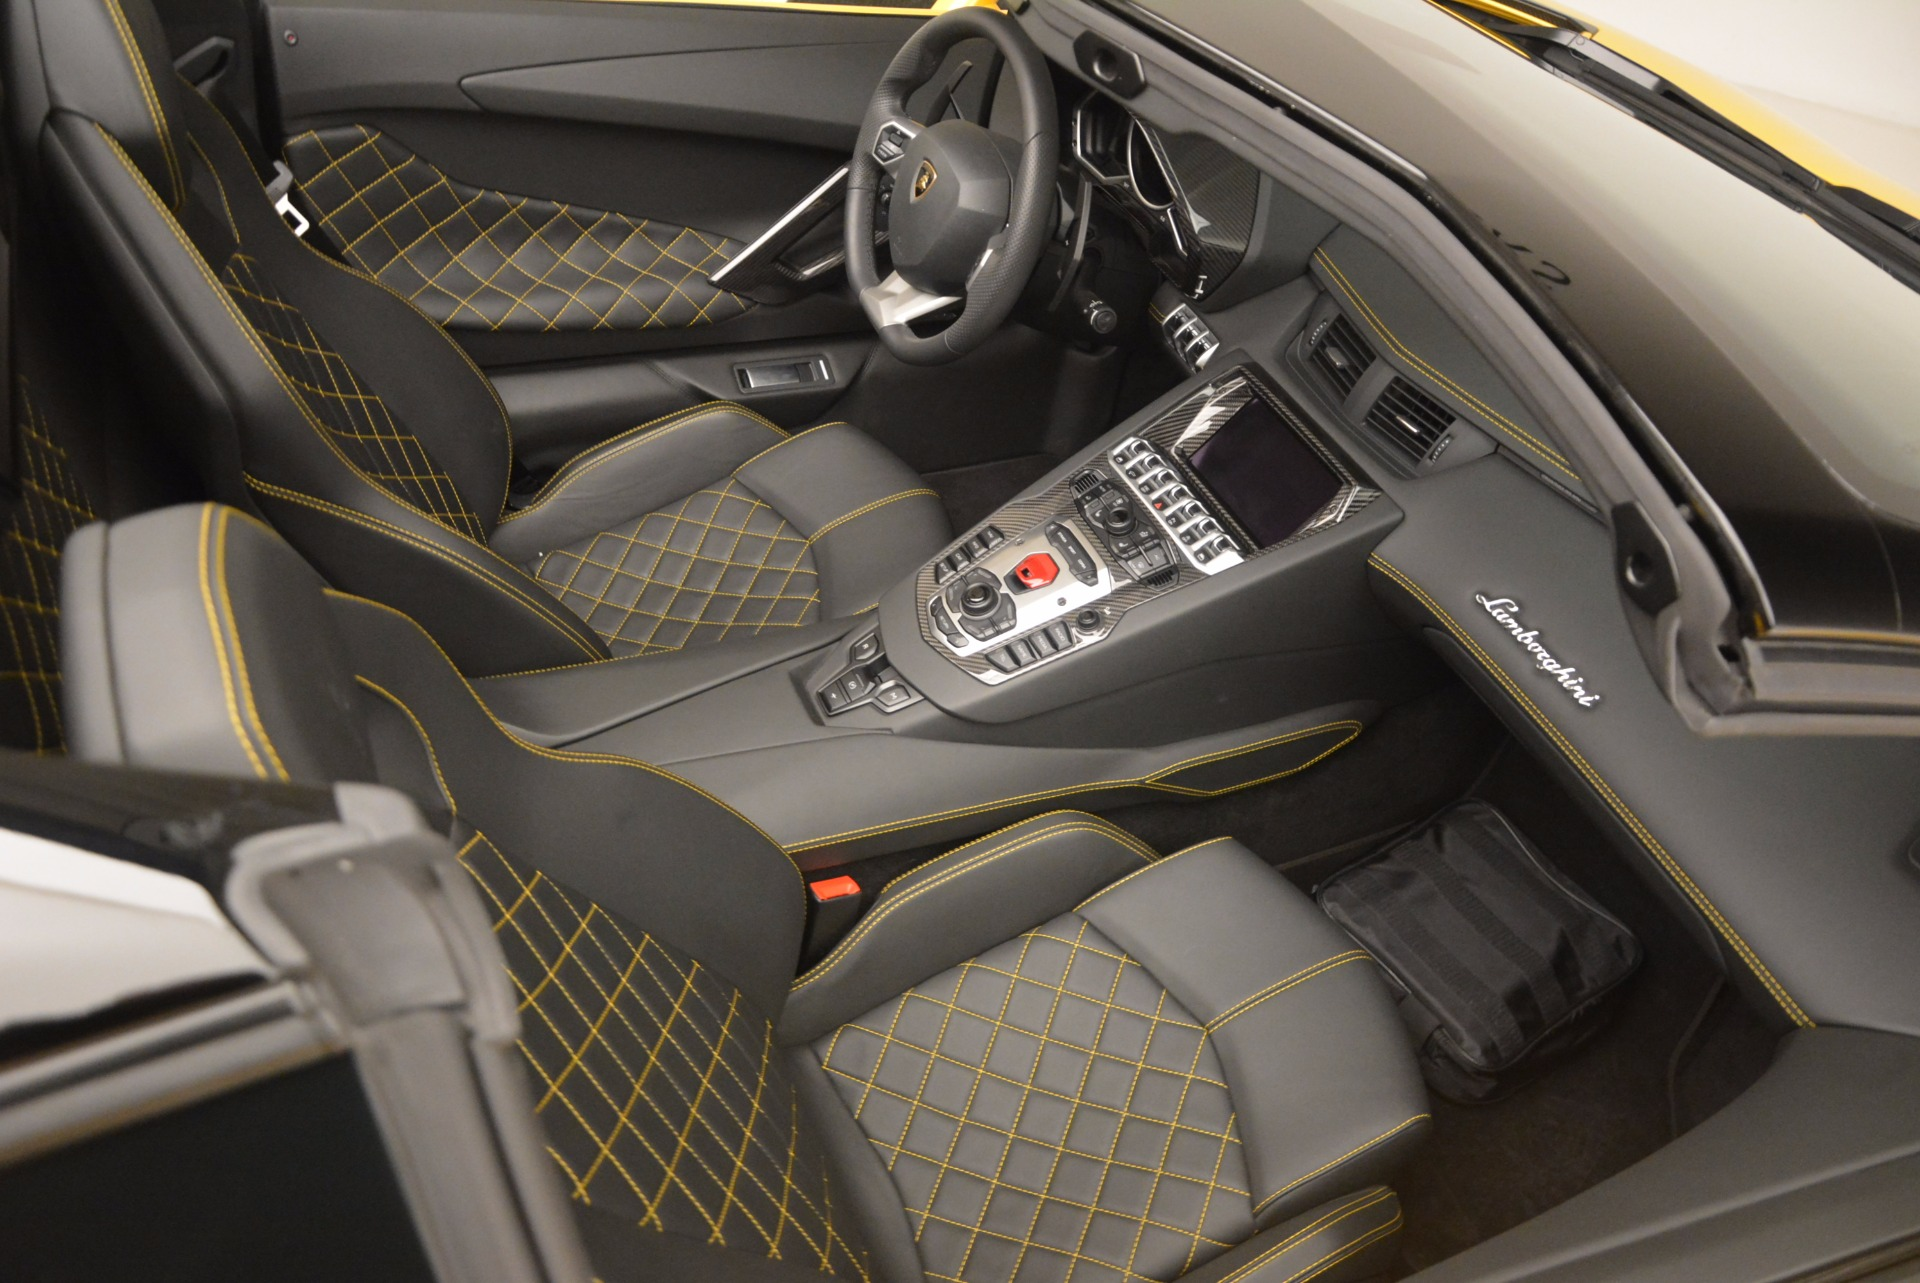 Used 2015 Lamborghini Aventador LP 700 4 Roadster